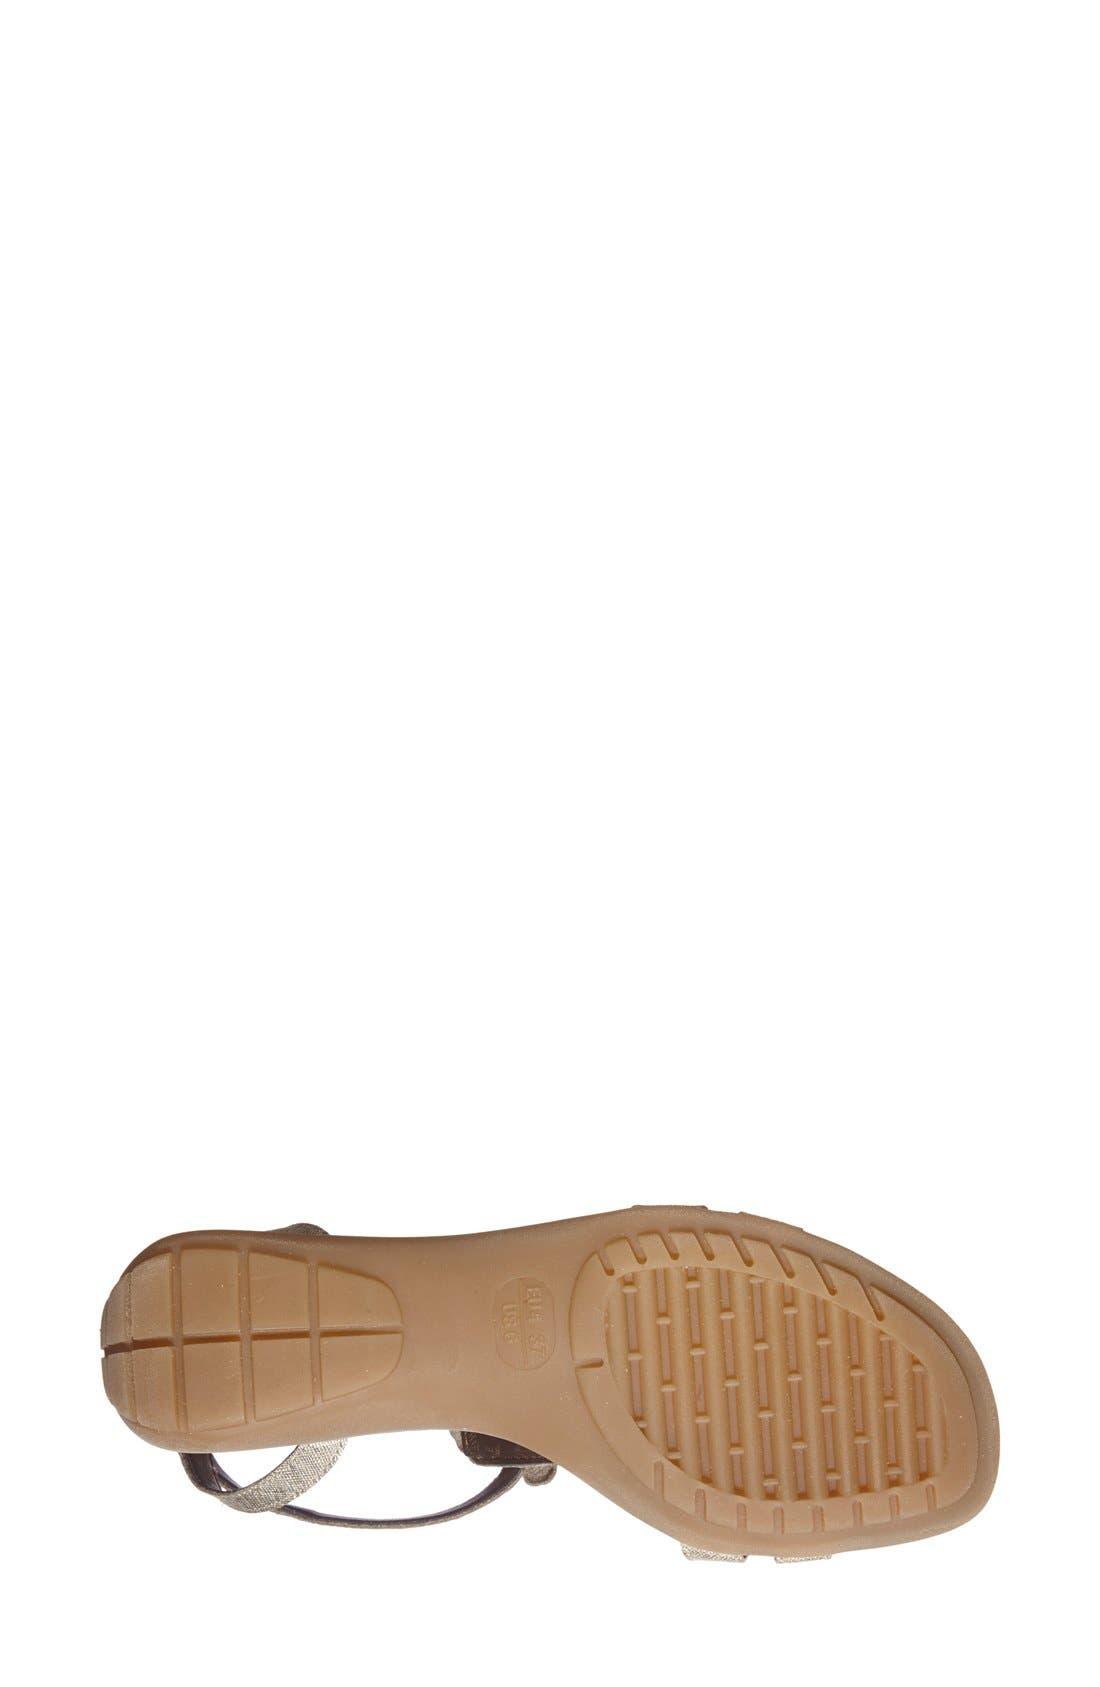 Alternate Image 4  - The FLEXX 'Gladiola' Leather Sandal (Women)